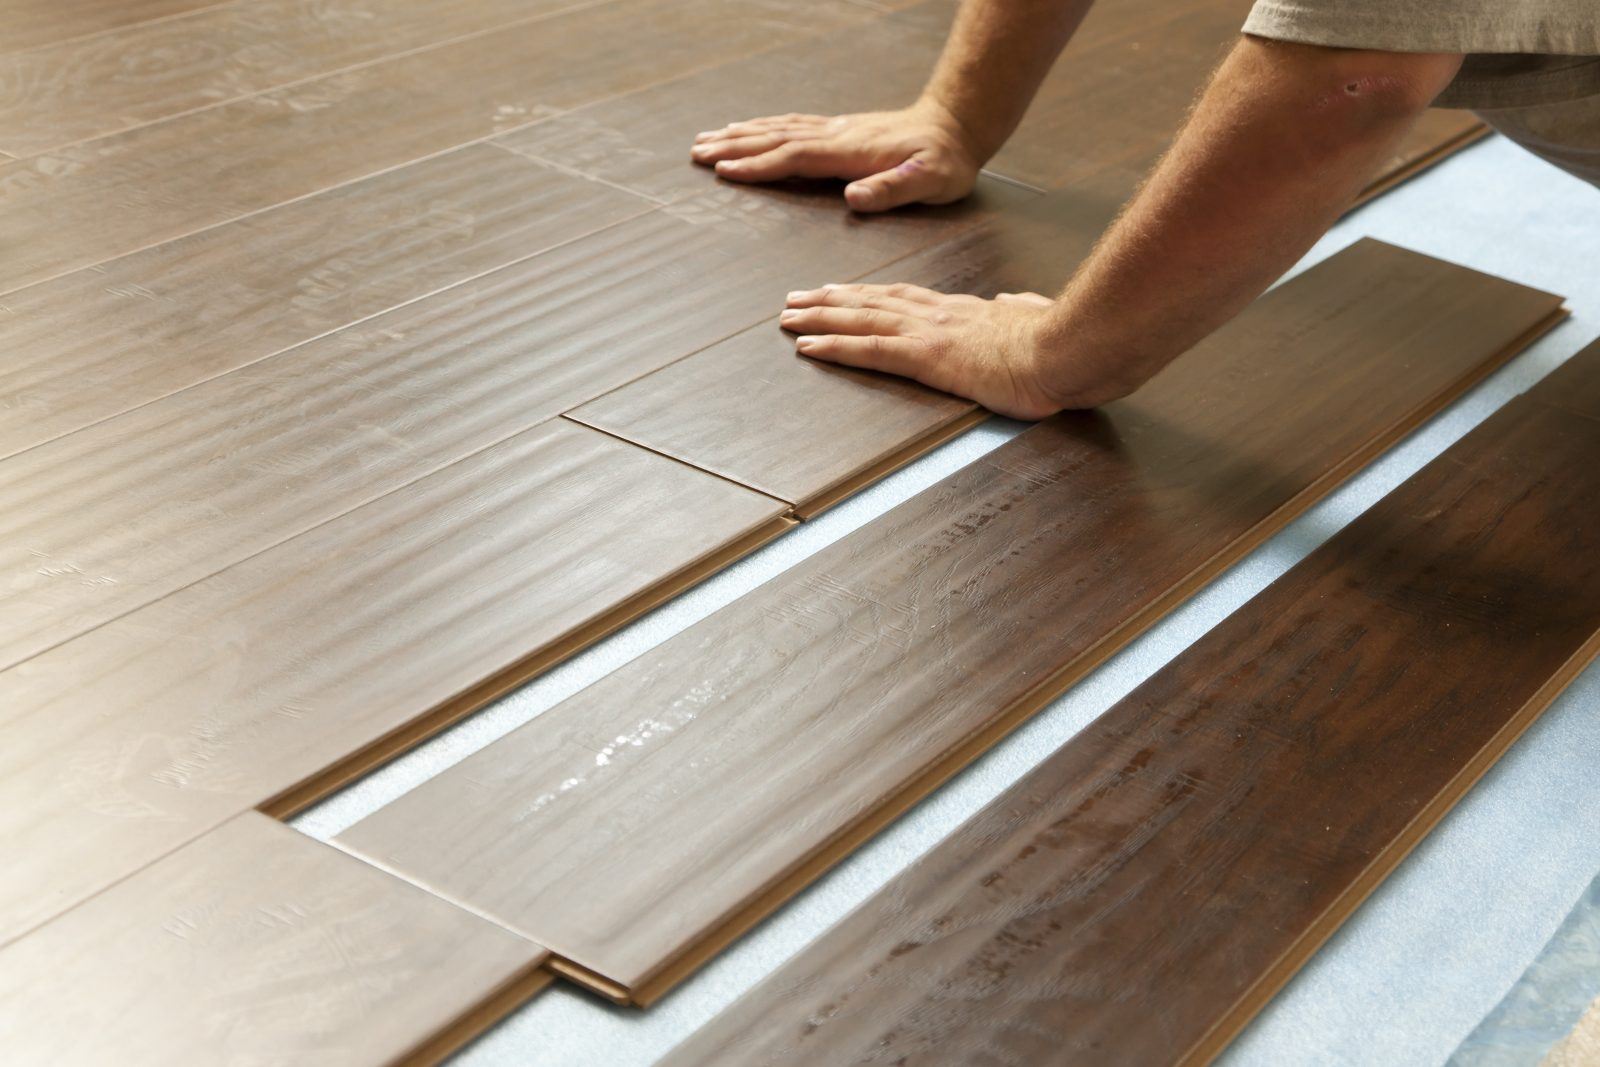 Man Installing New Laminate Wood Flooring | The Carpet Stop